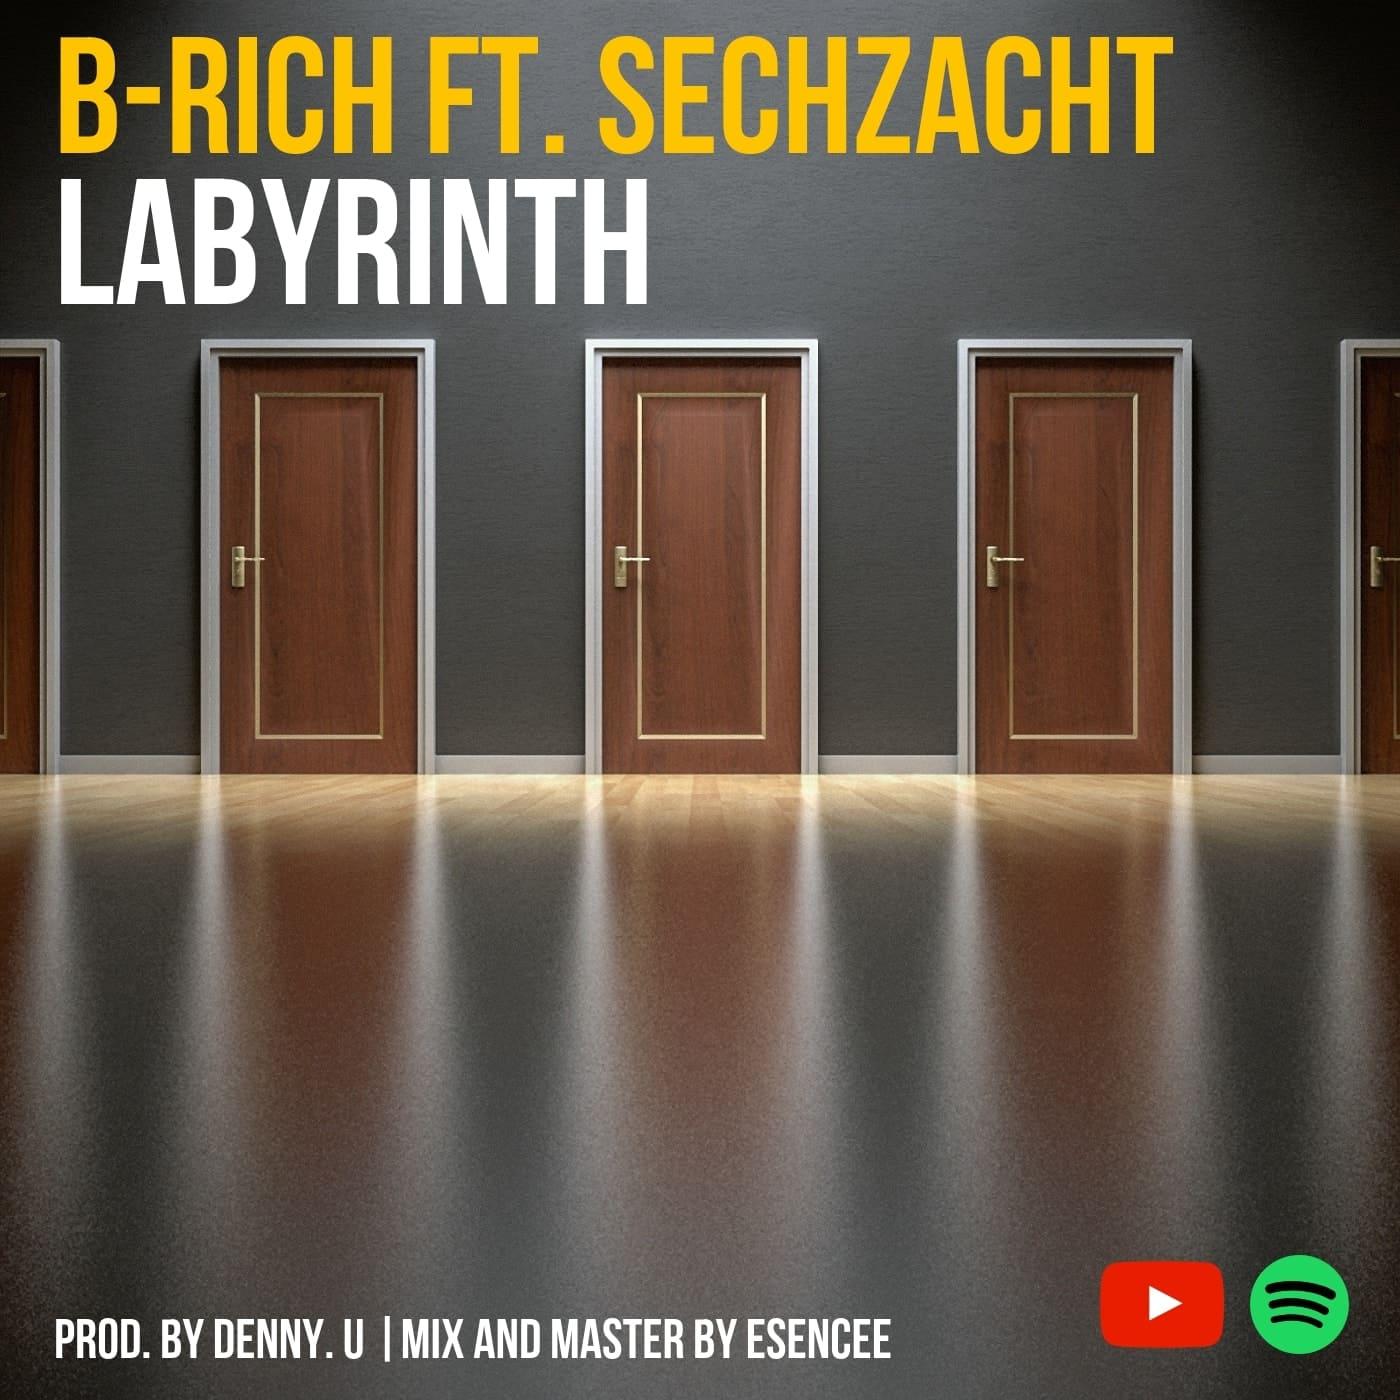 Upcoming: B-RICH, SECHZACHT - Labyrinth